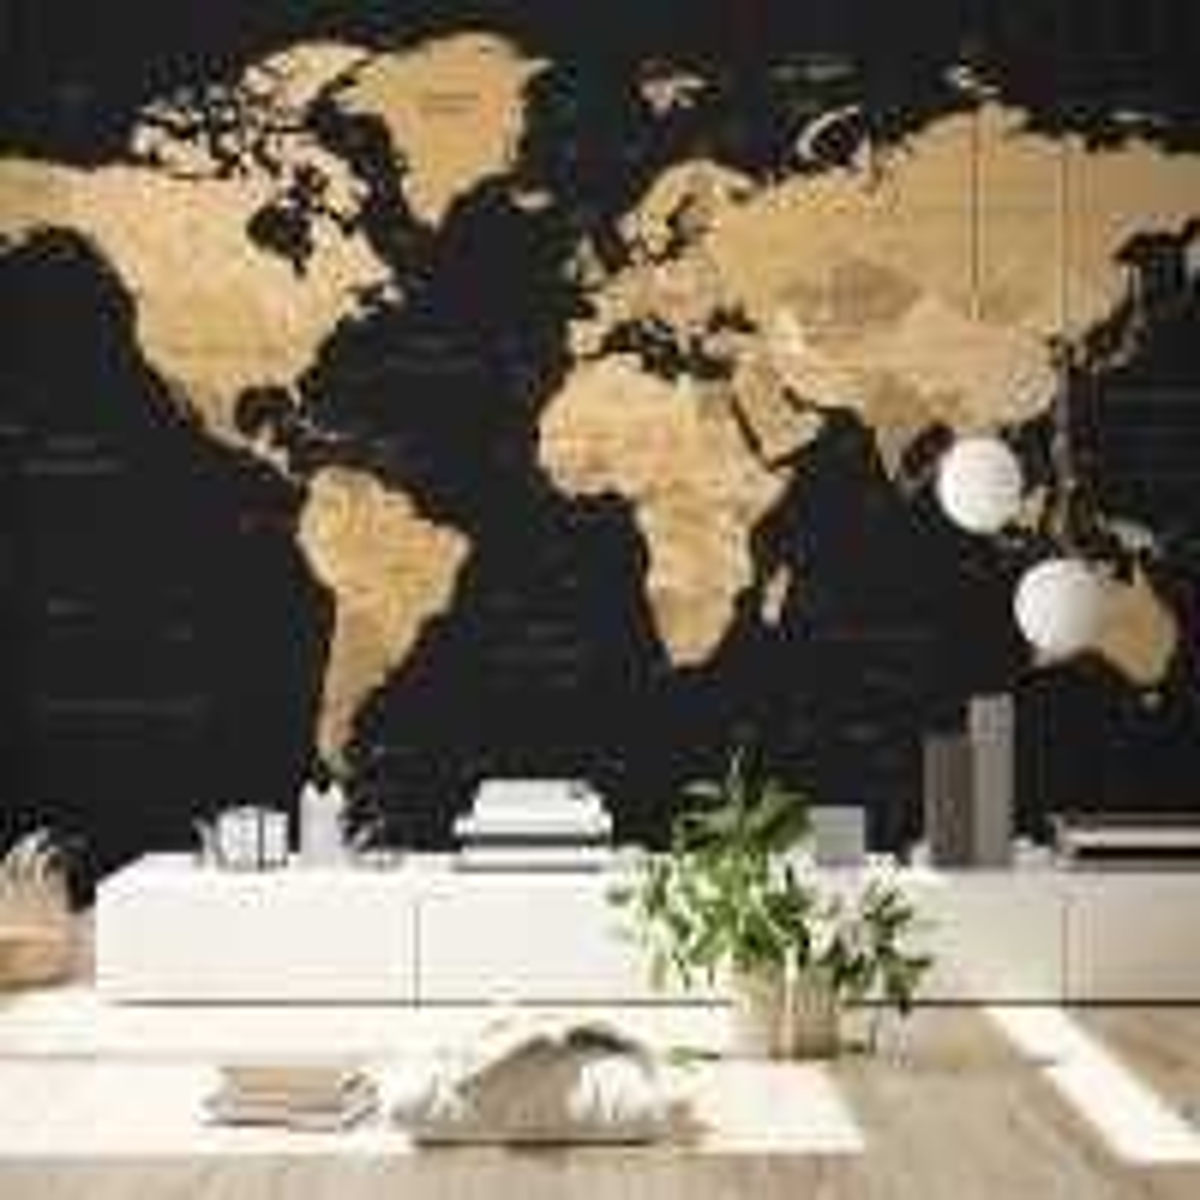 Black Political World Map Wallpaper Mural